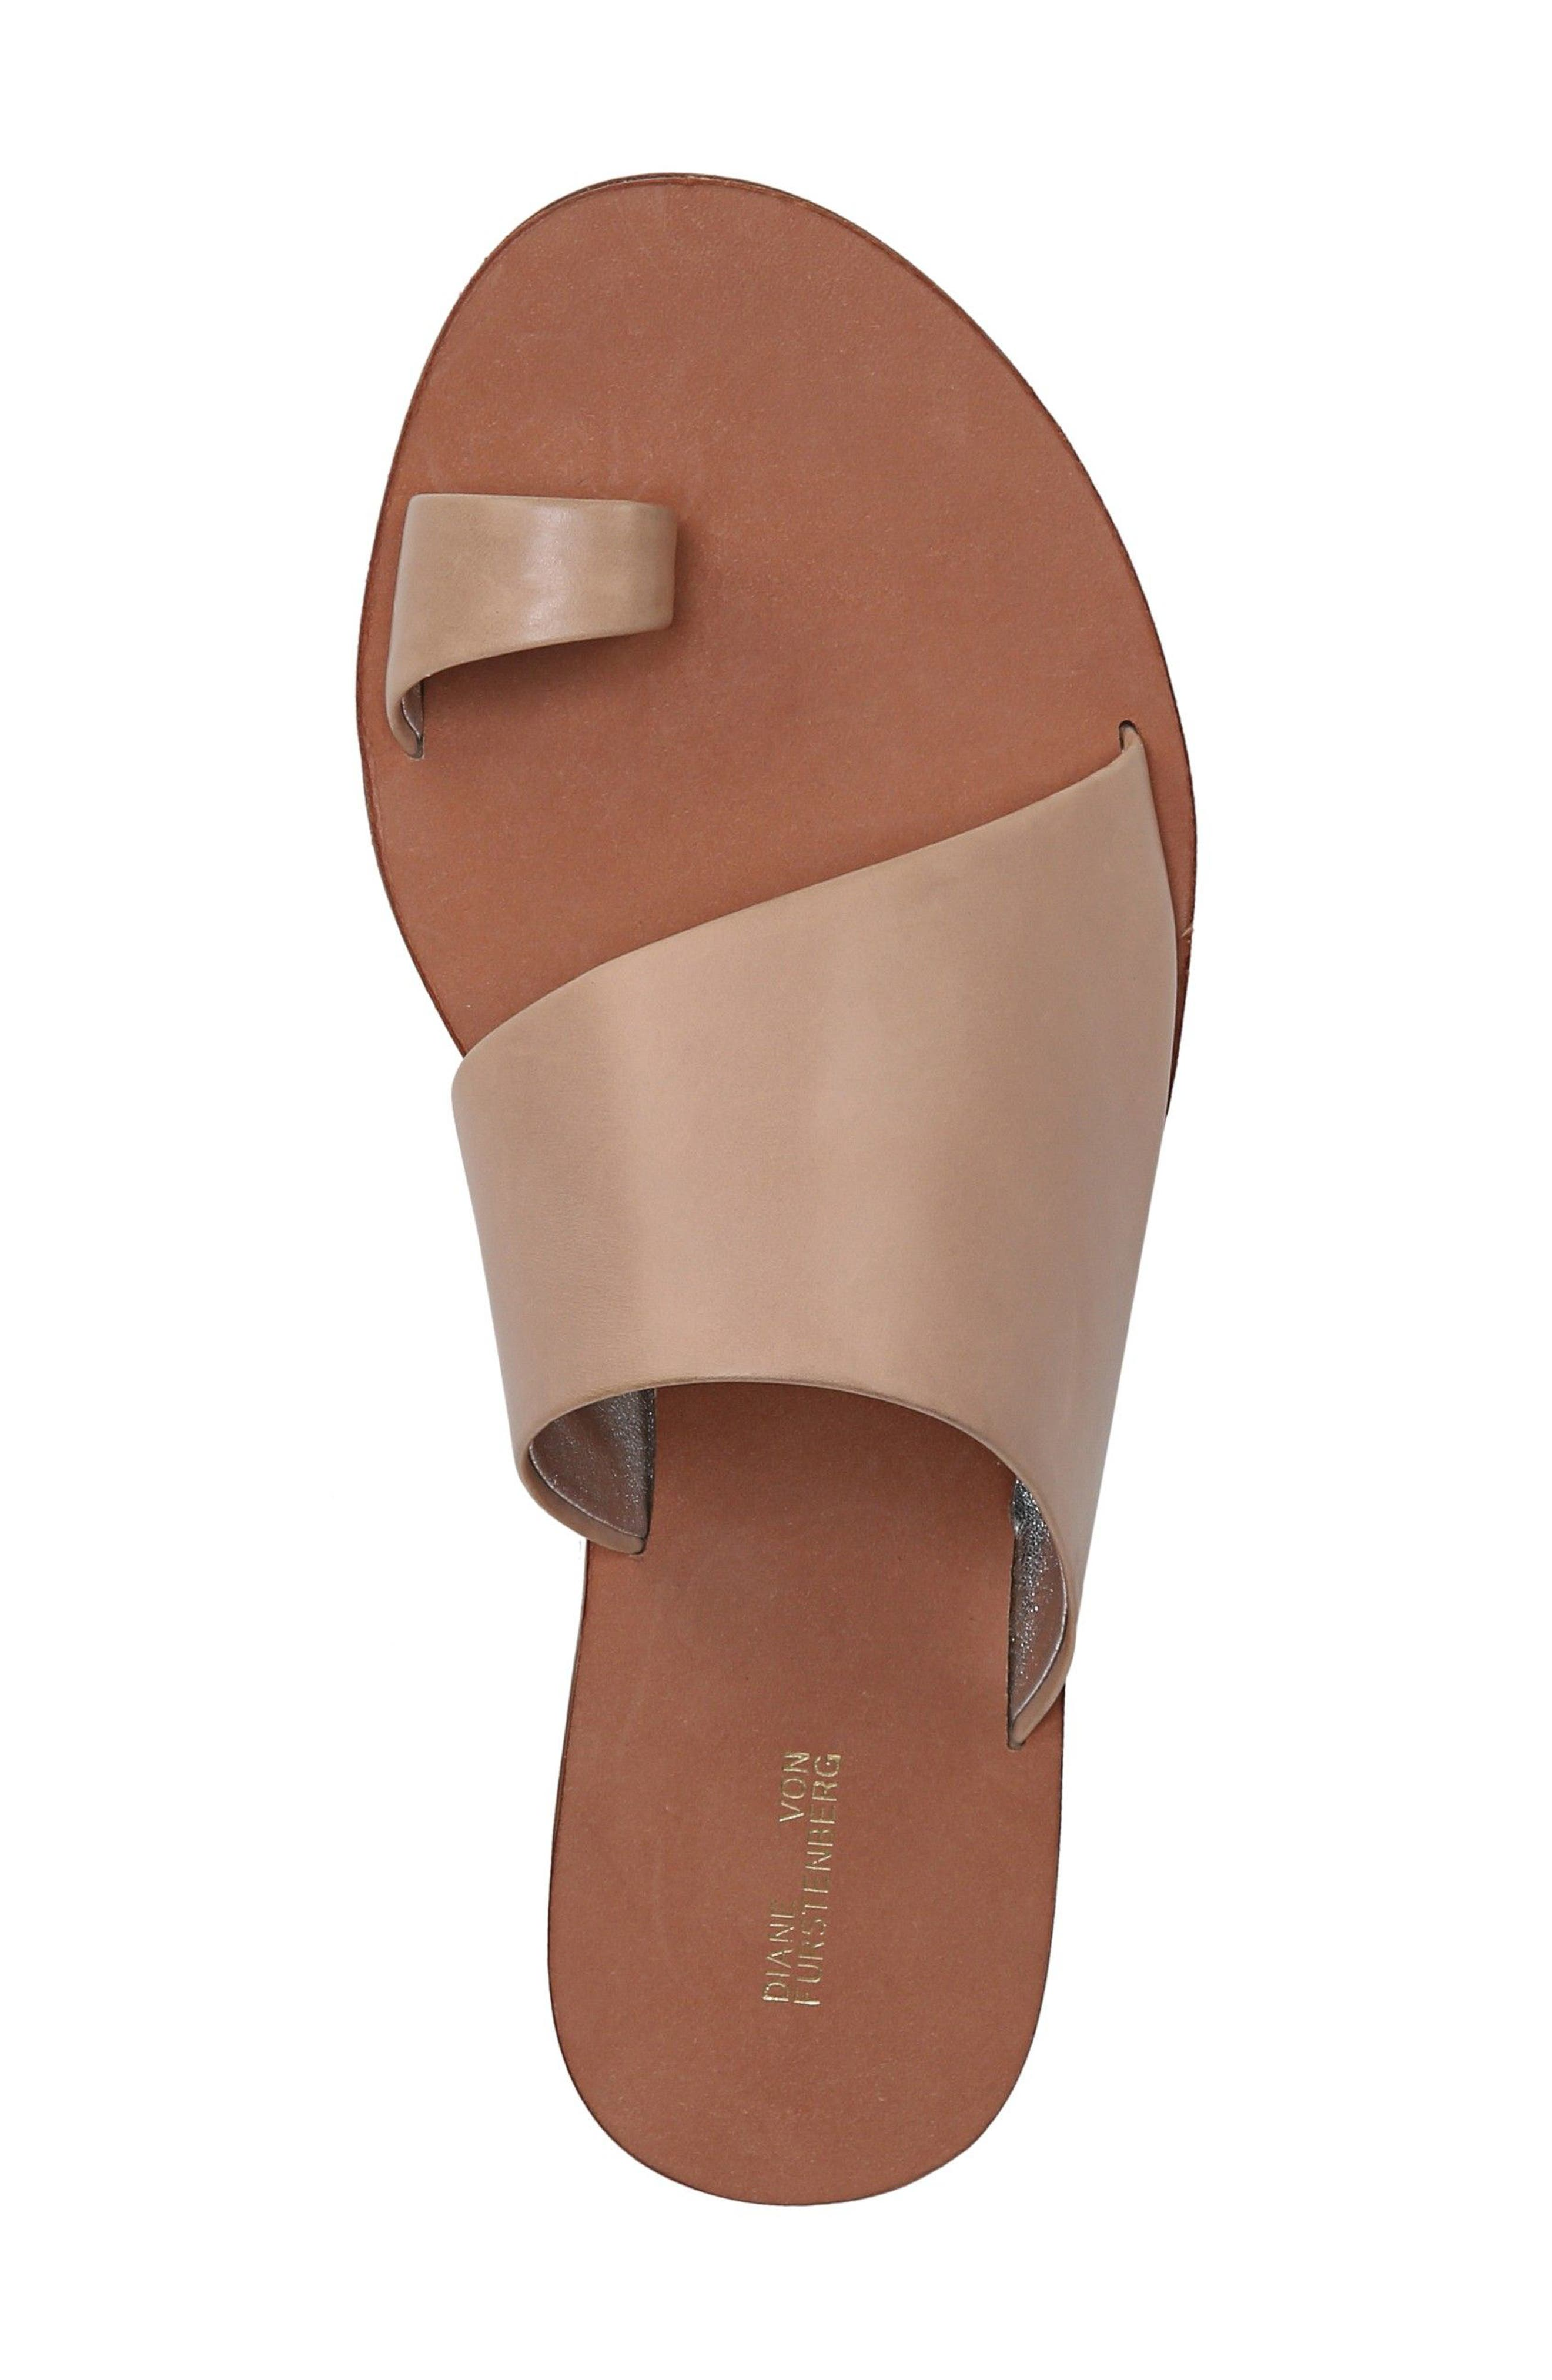 Brittany Asymmetrical Flat Sandal,                             Alternate thumbnail 5, color,                             202